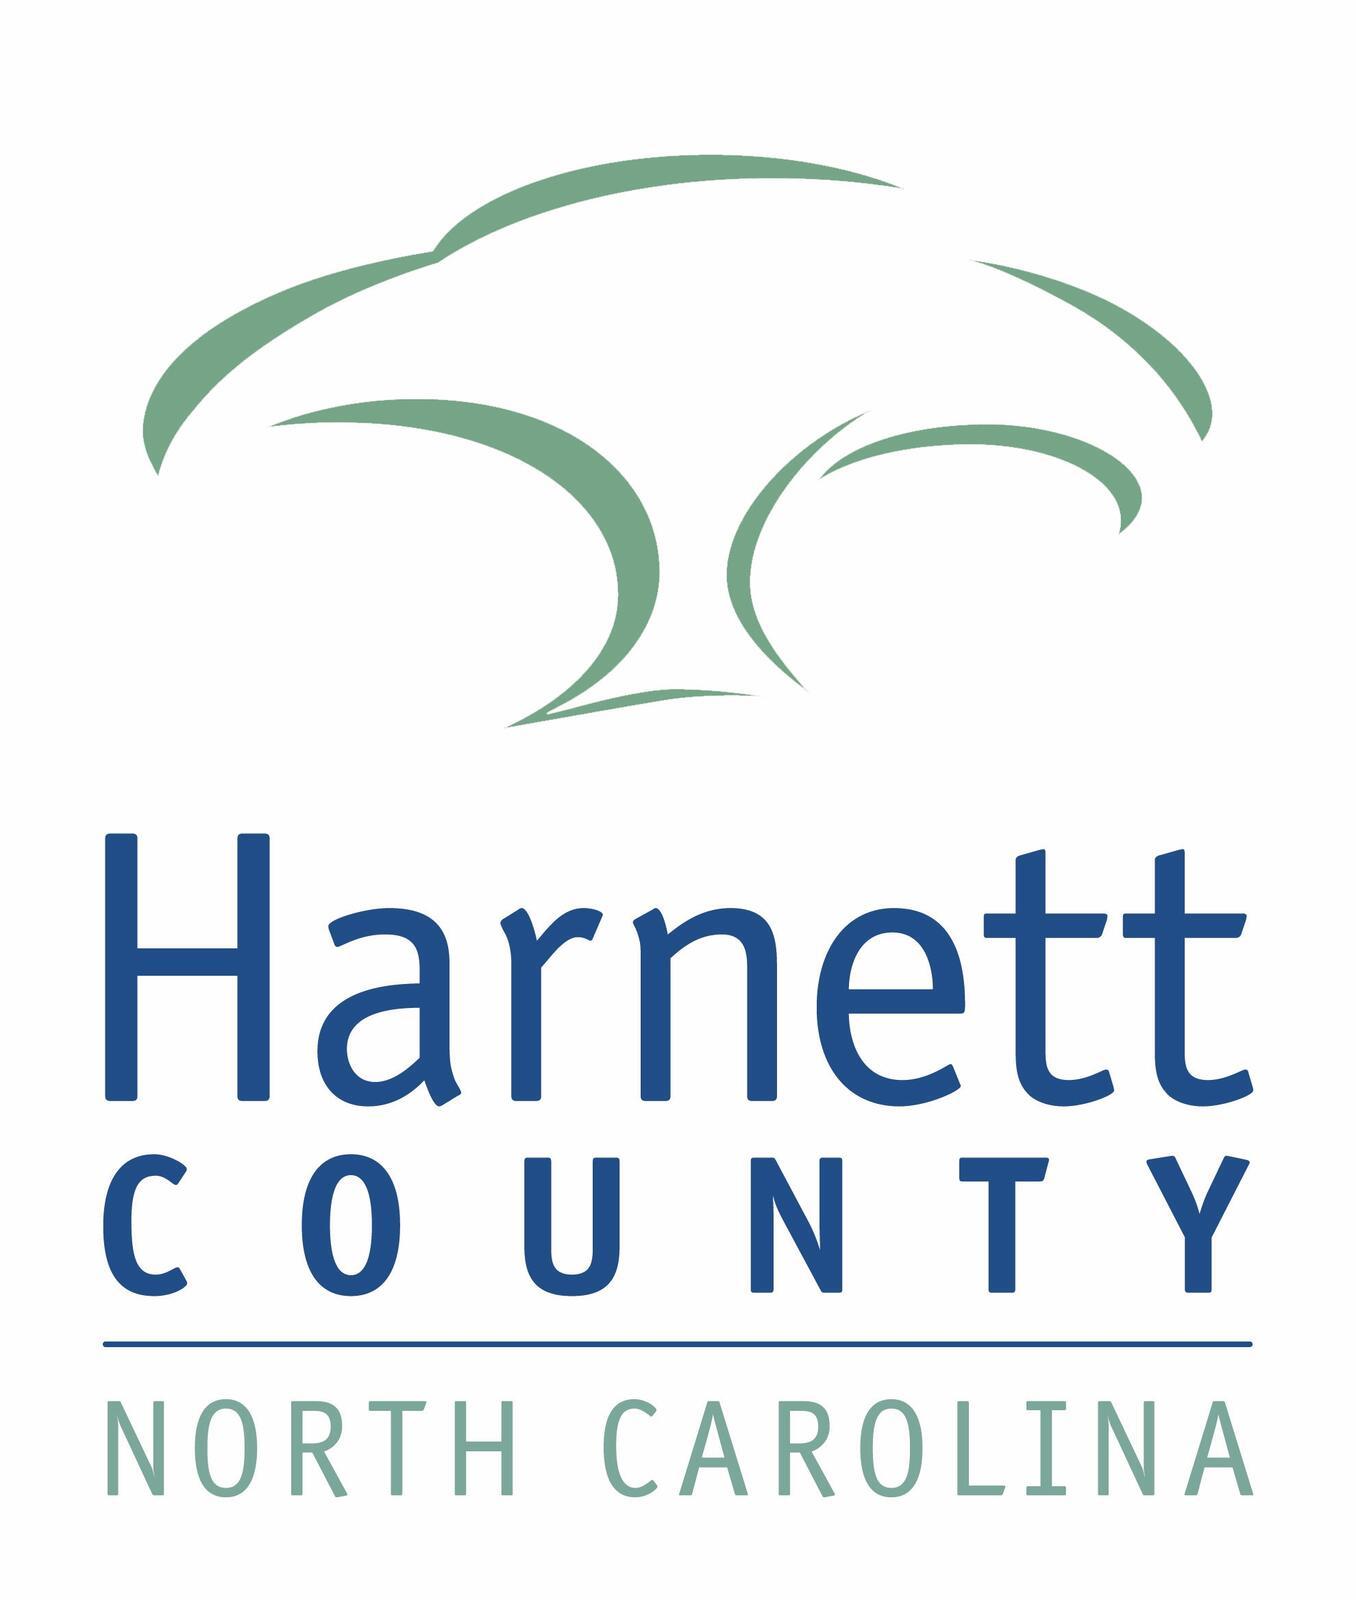 harnett county water bill pay